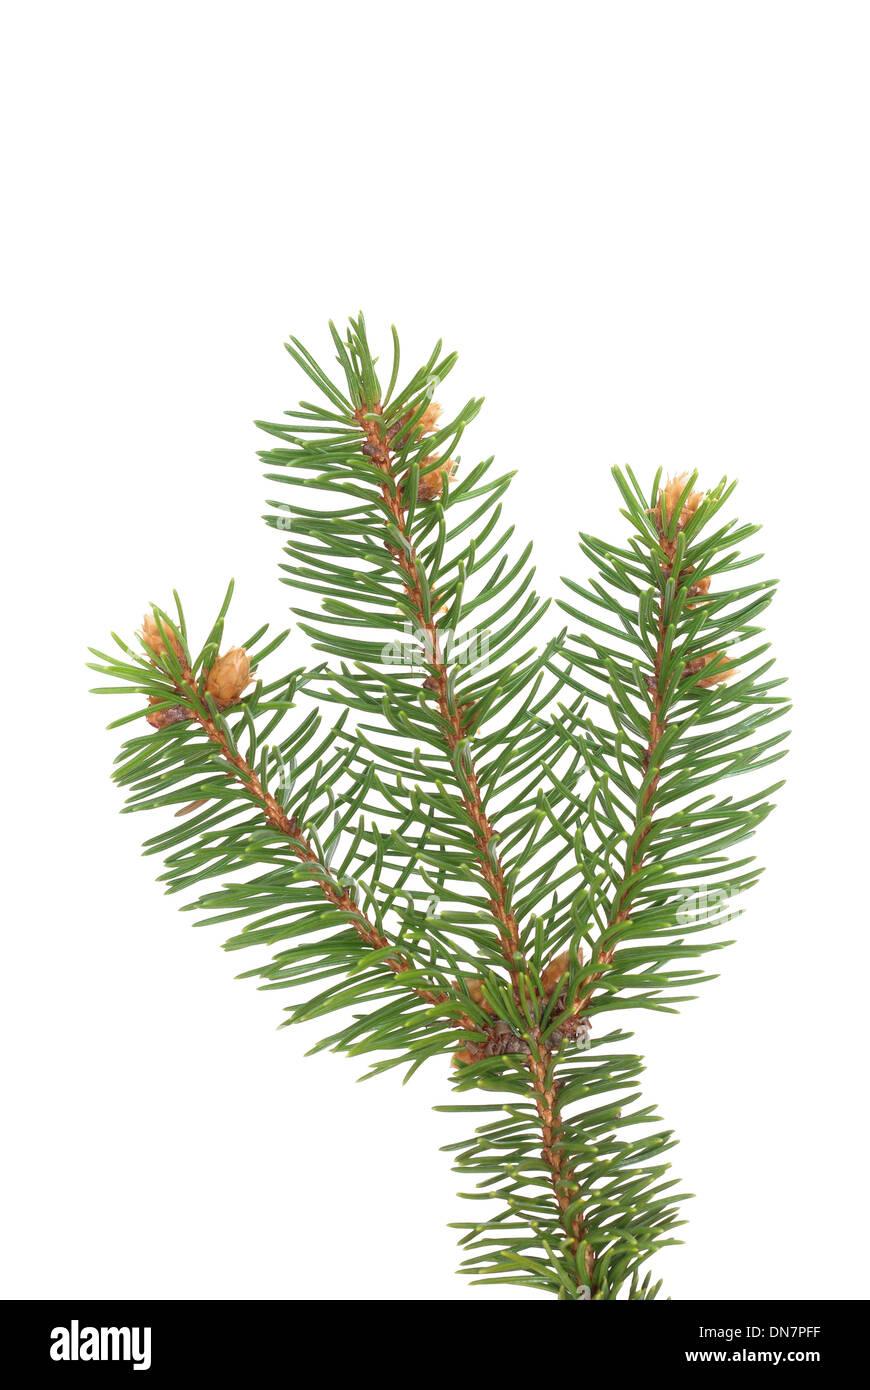 spruce's twig on white background - Stock Image